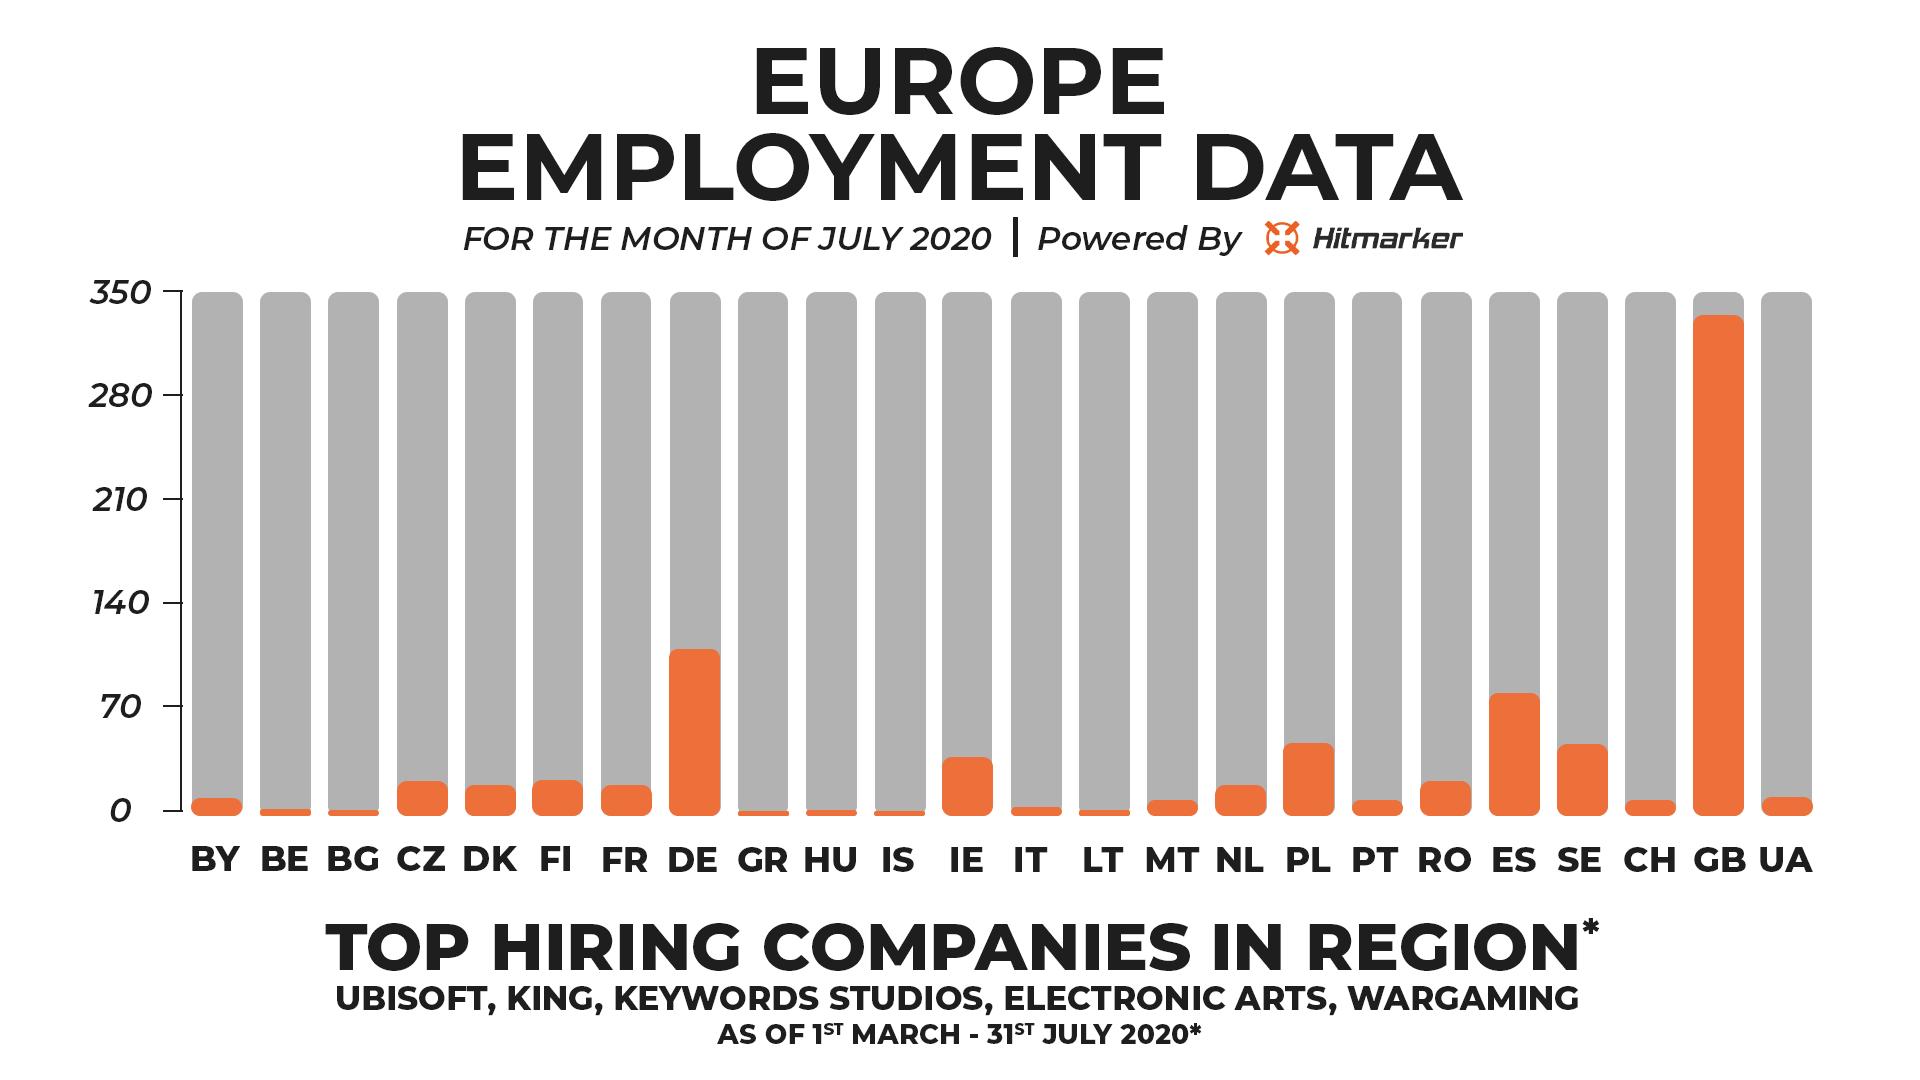 Hitmarker Employment Data Europe